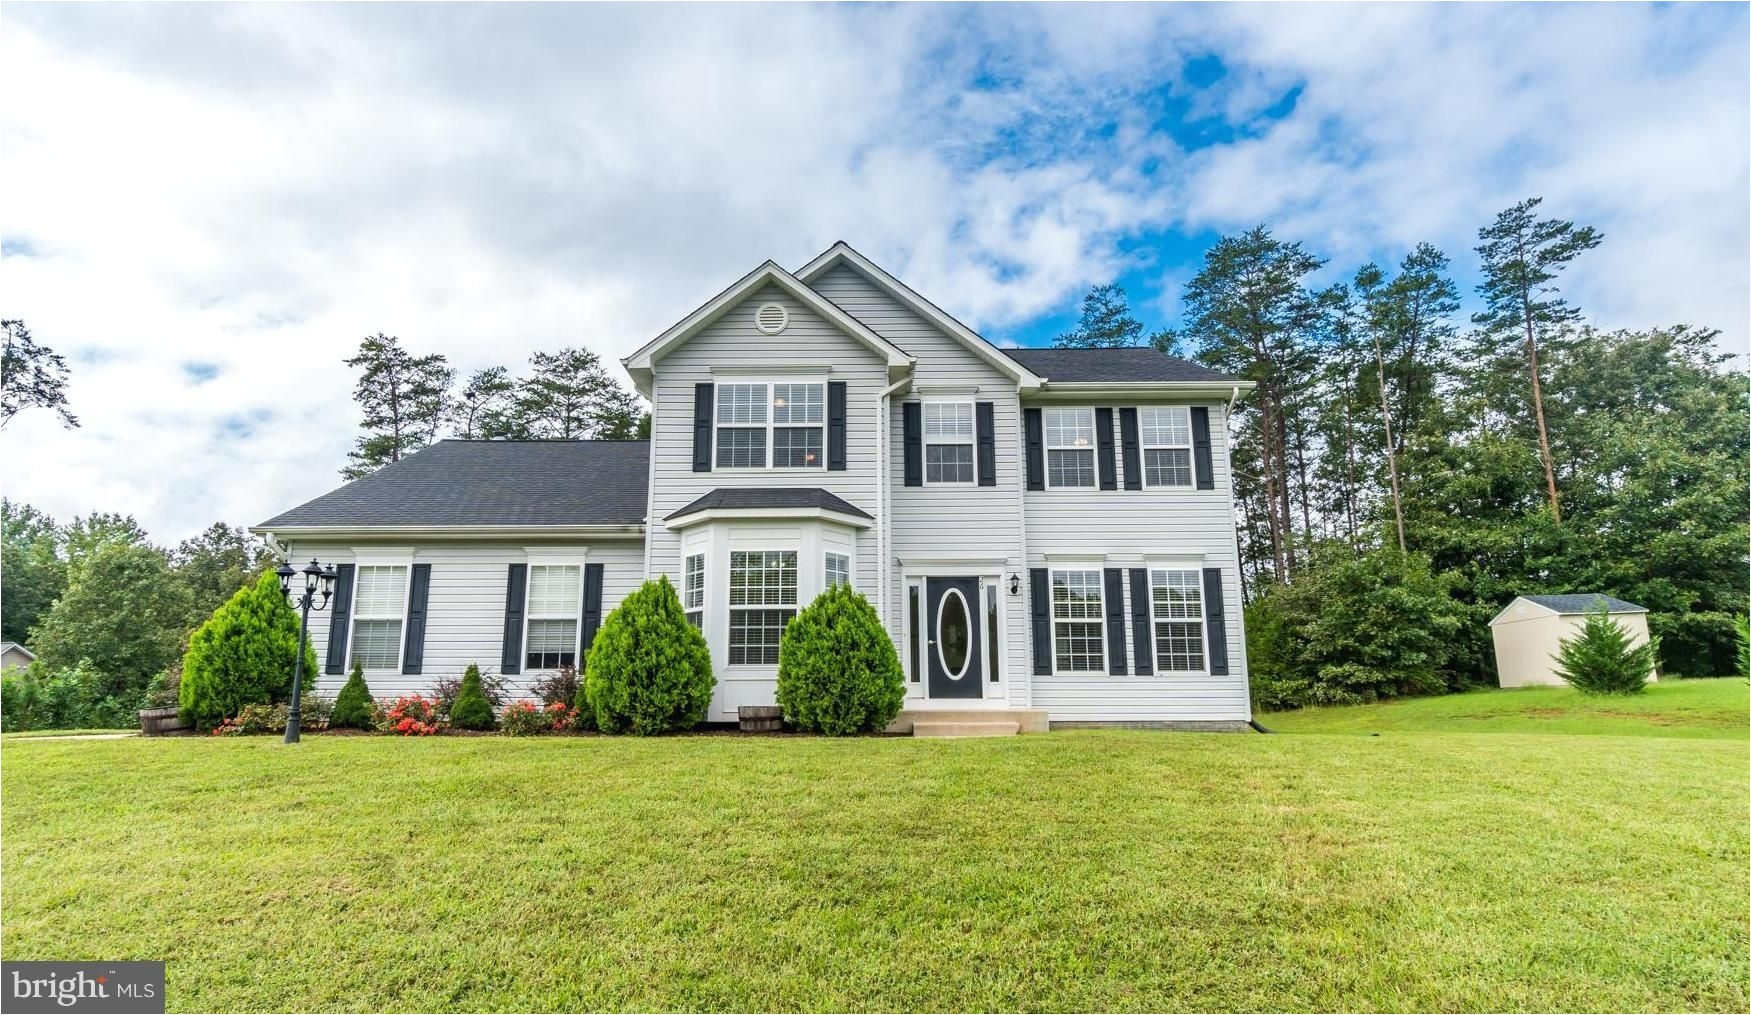 Homes for Sale 22556 26 Bainbridge Ct Stafford Va 22556 Trulia